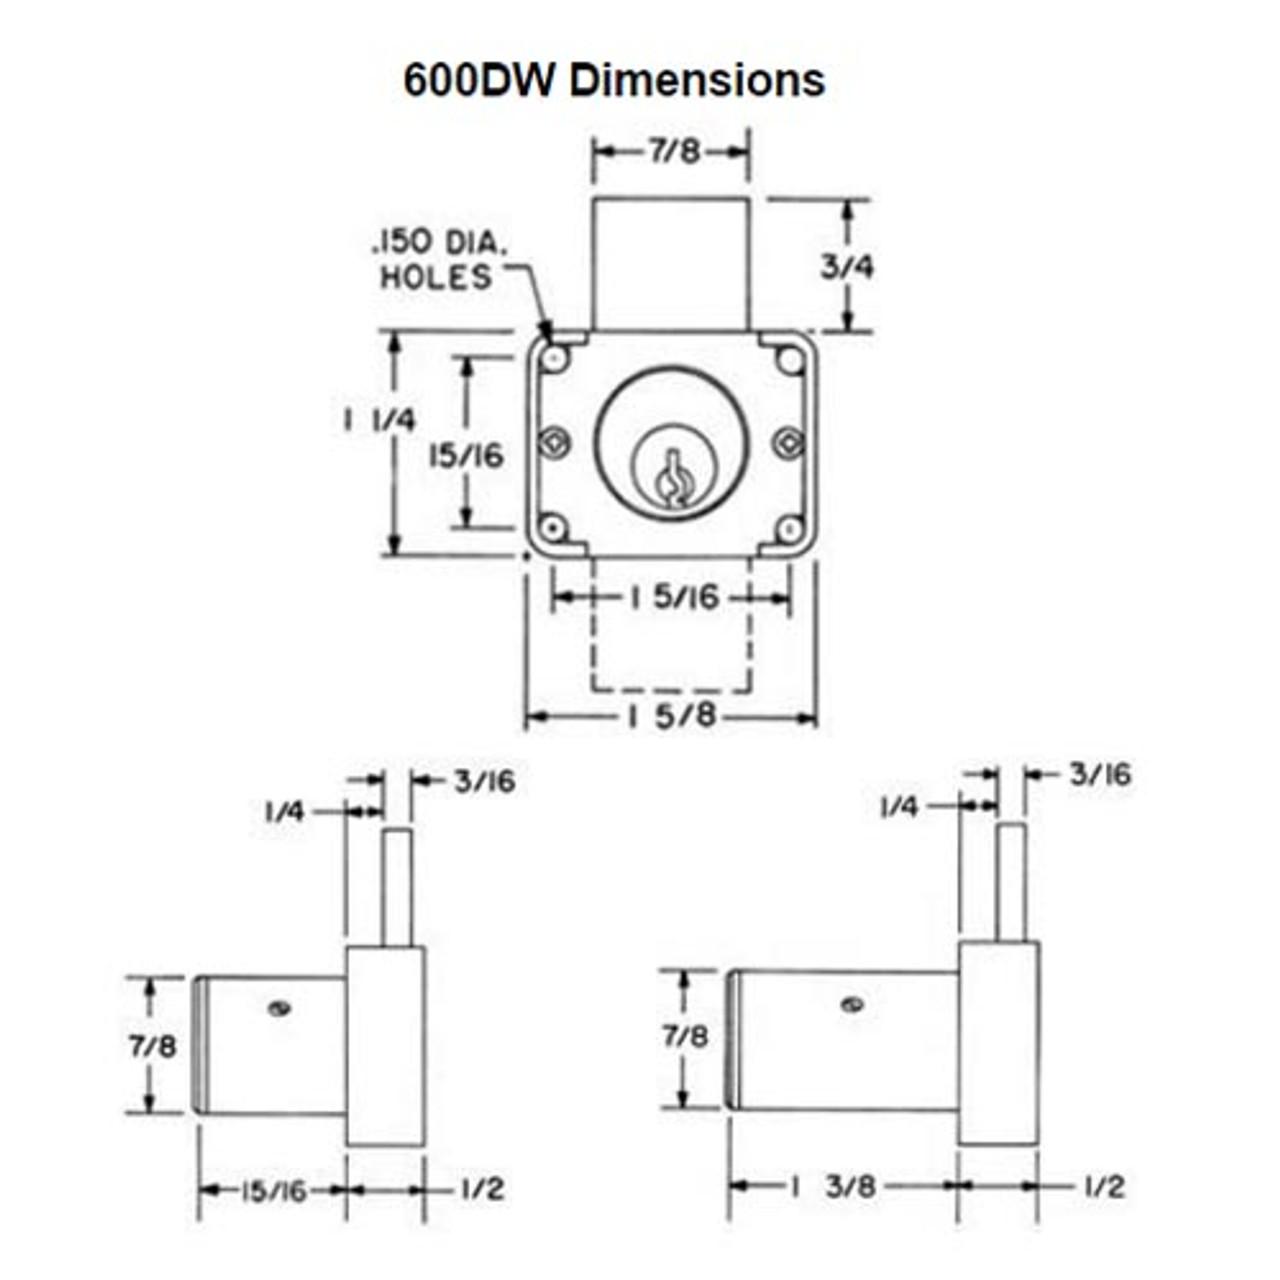 Olympus 600DW-KA4T3-26D-7/8 R Series Drawer Deadbolt Cabinet Locks in Satin Chrome